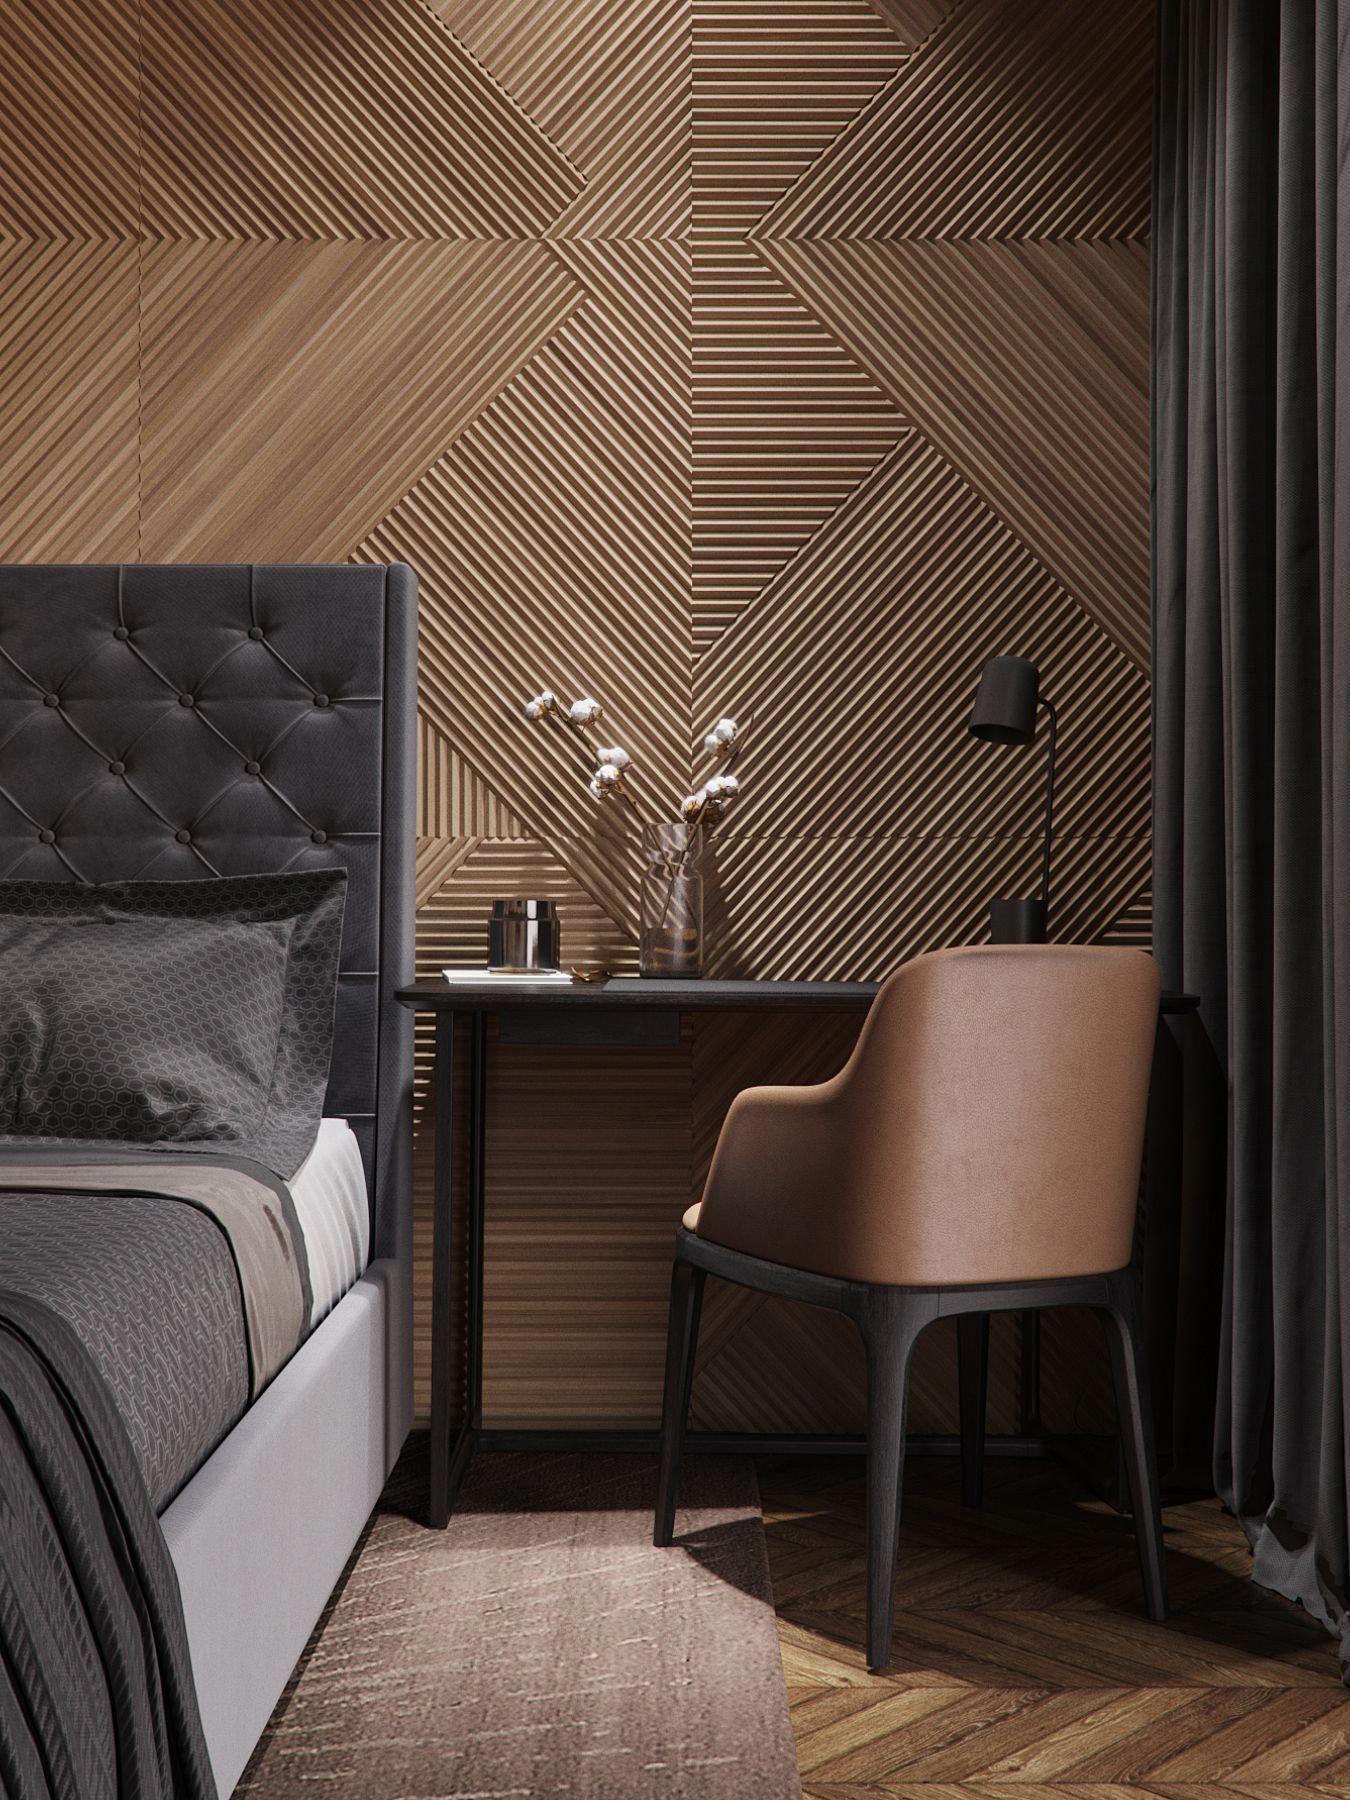 Vizualizaciya Gostinichnyh Nomerov Galereya 3ddd Ru Lightingforhomes Hotel Room Design Bedroom Design Contemporary Bedroom